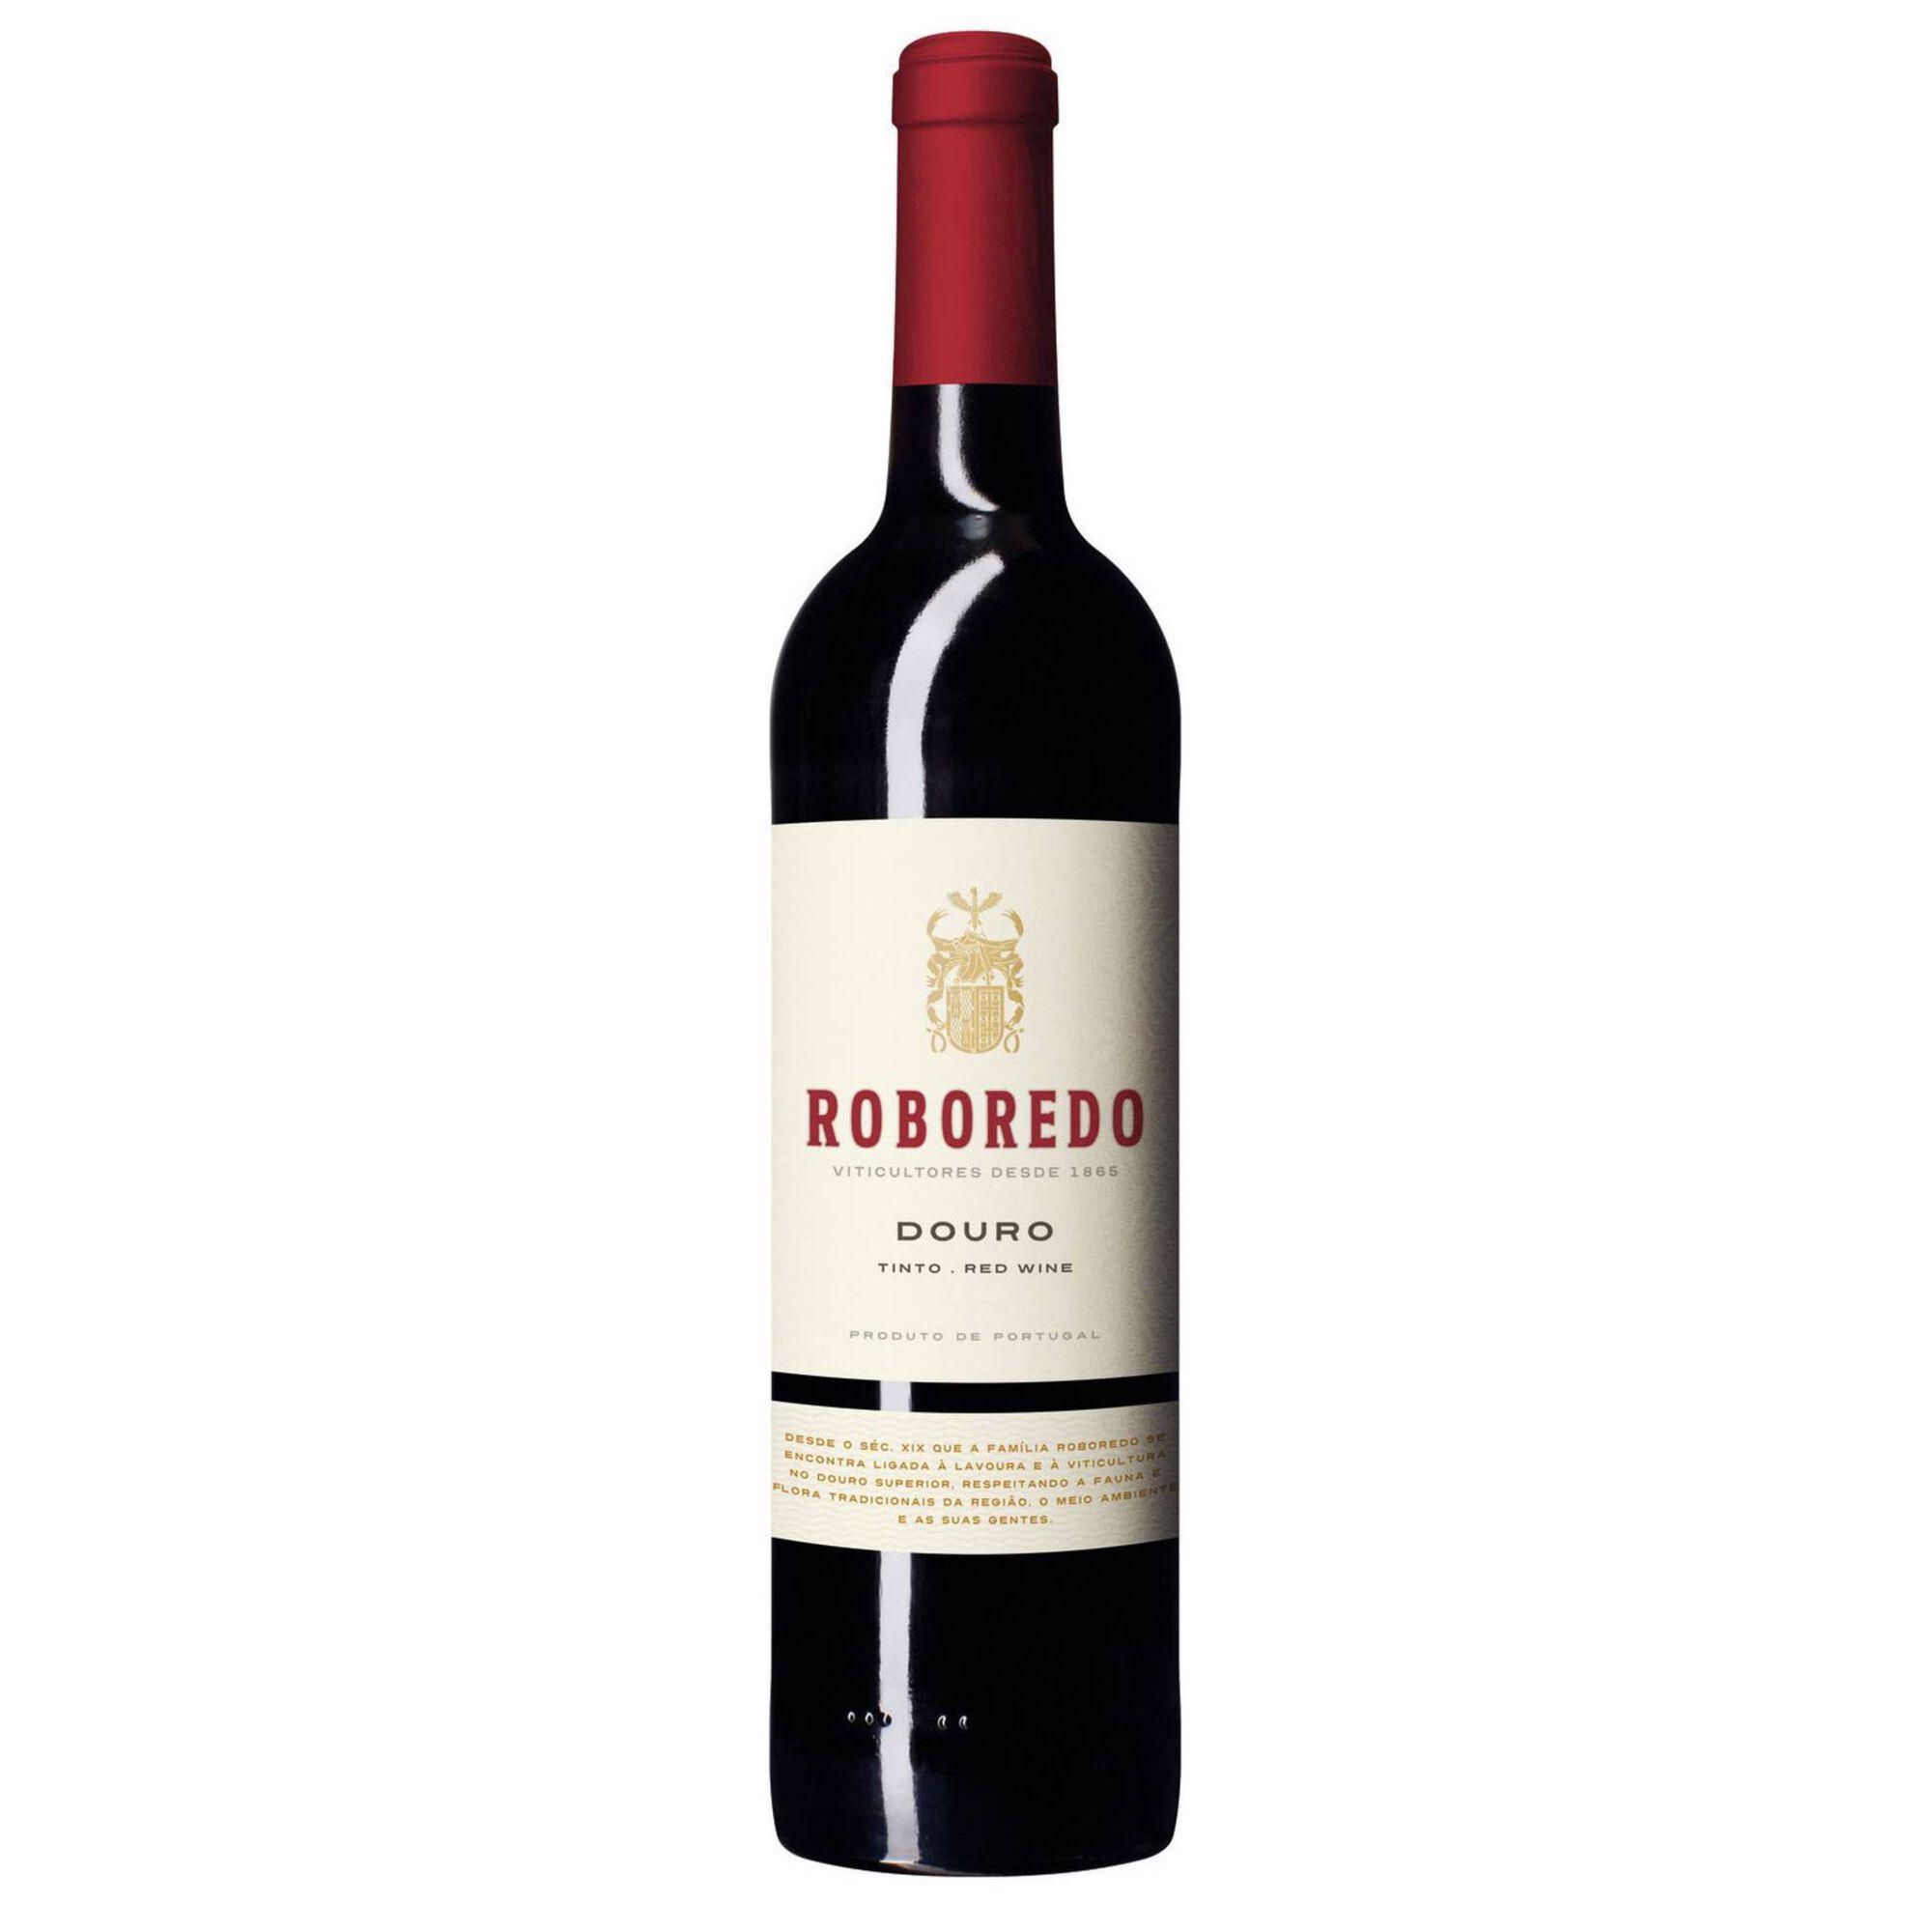 Roboredo DOC Douro Vinho Tinto